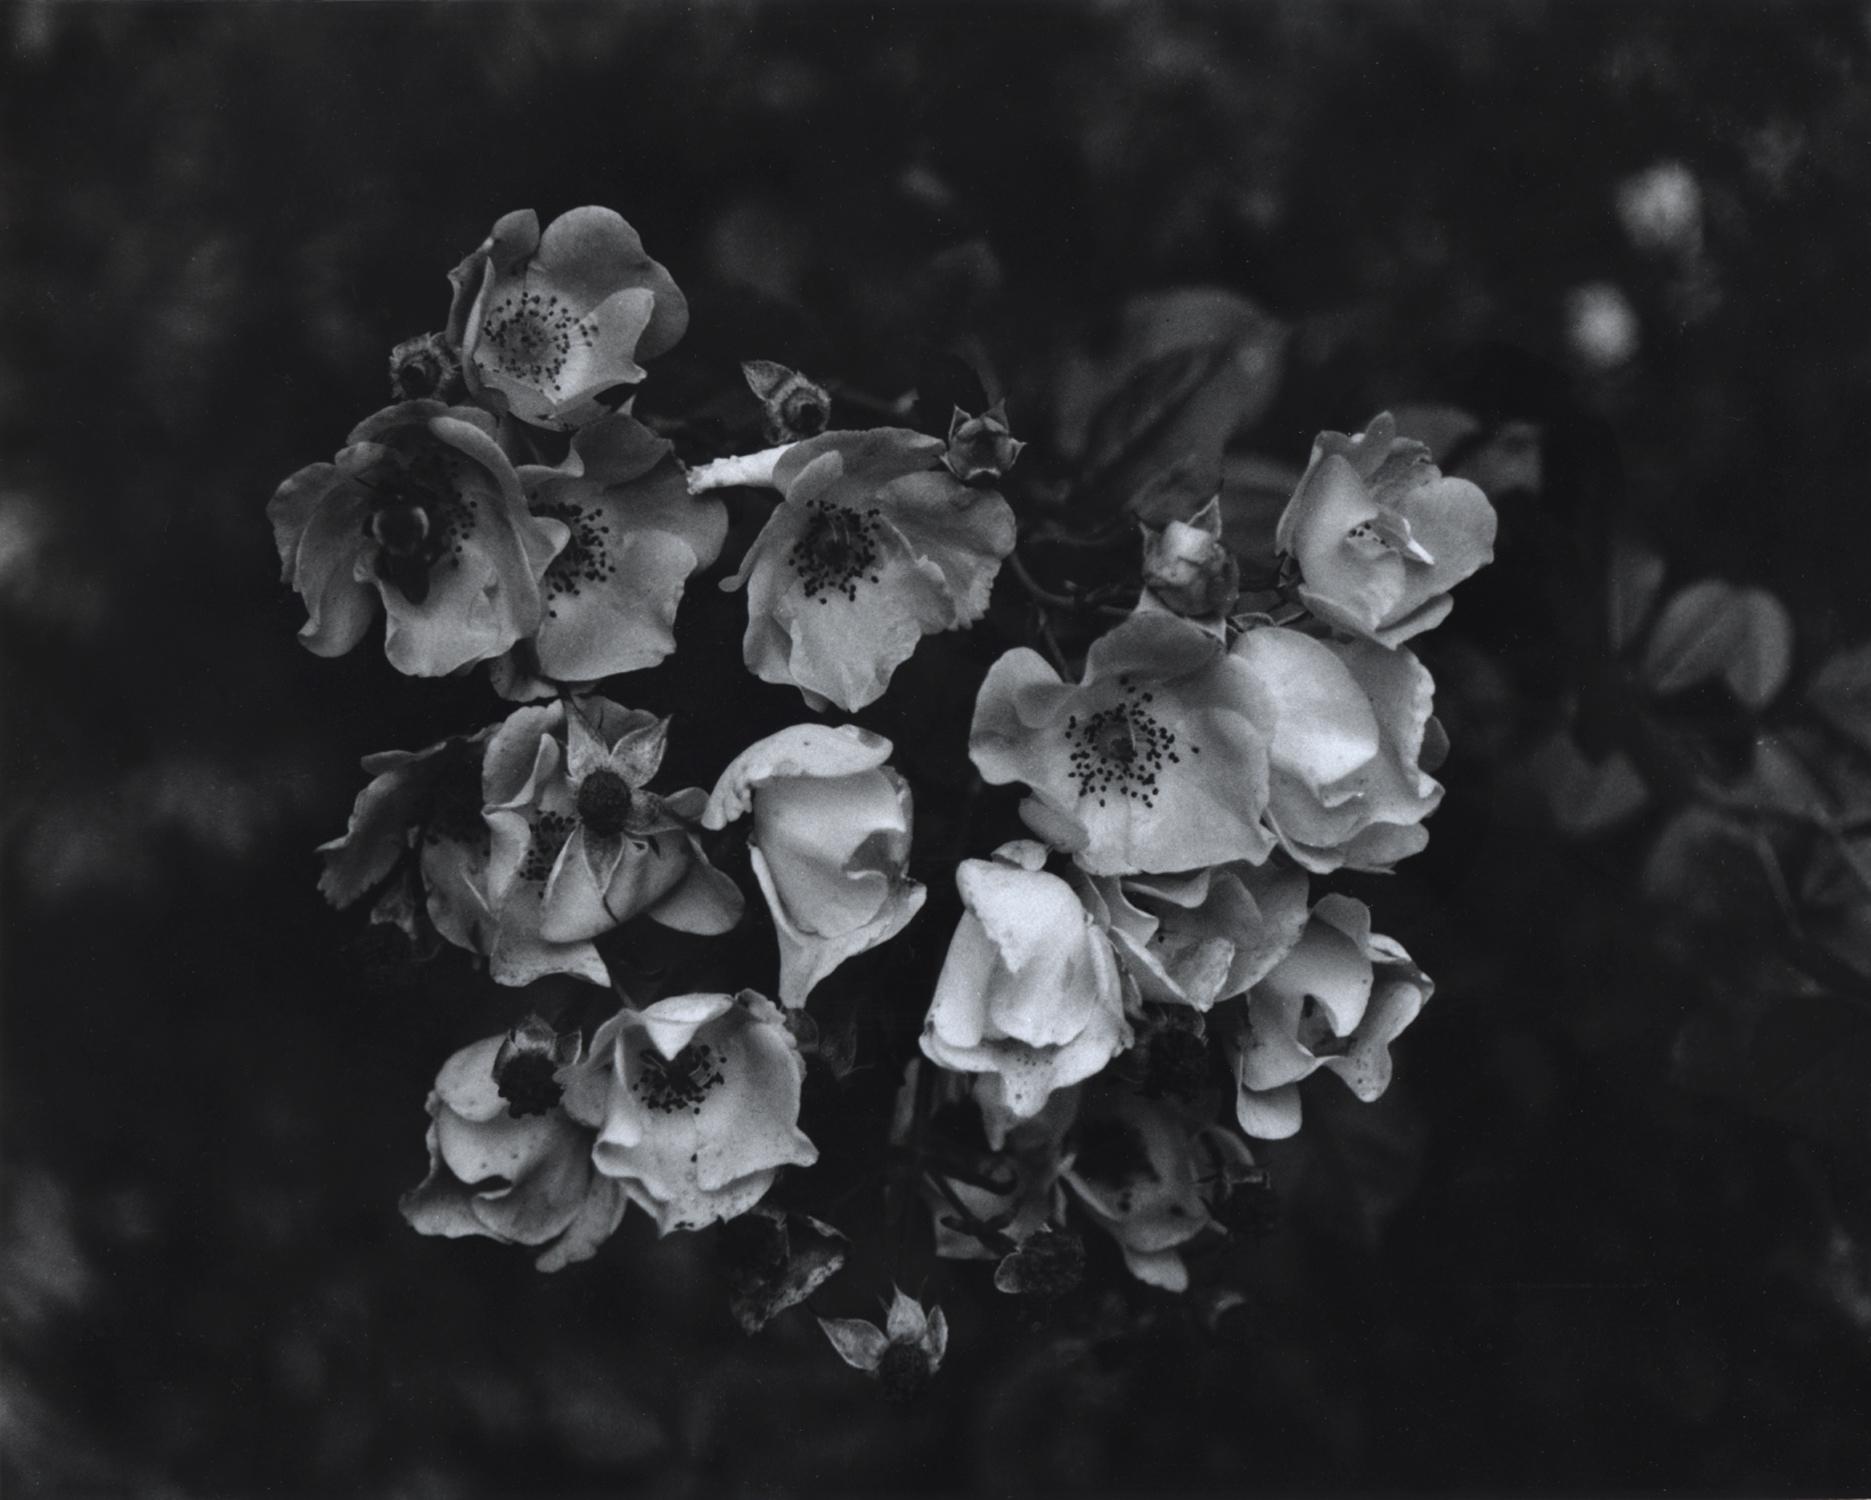 Cherry Blossoms - Black and White Photograph by Gillian Desmarais